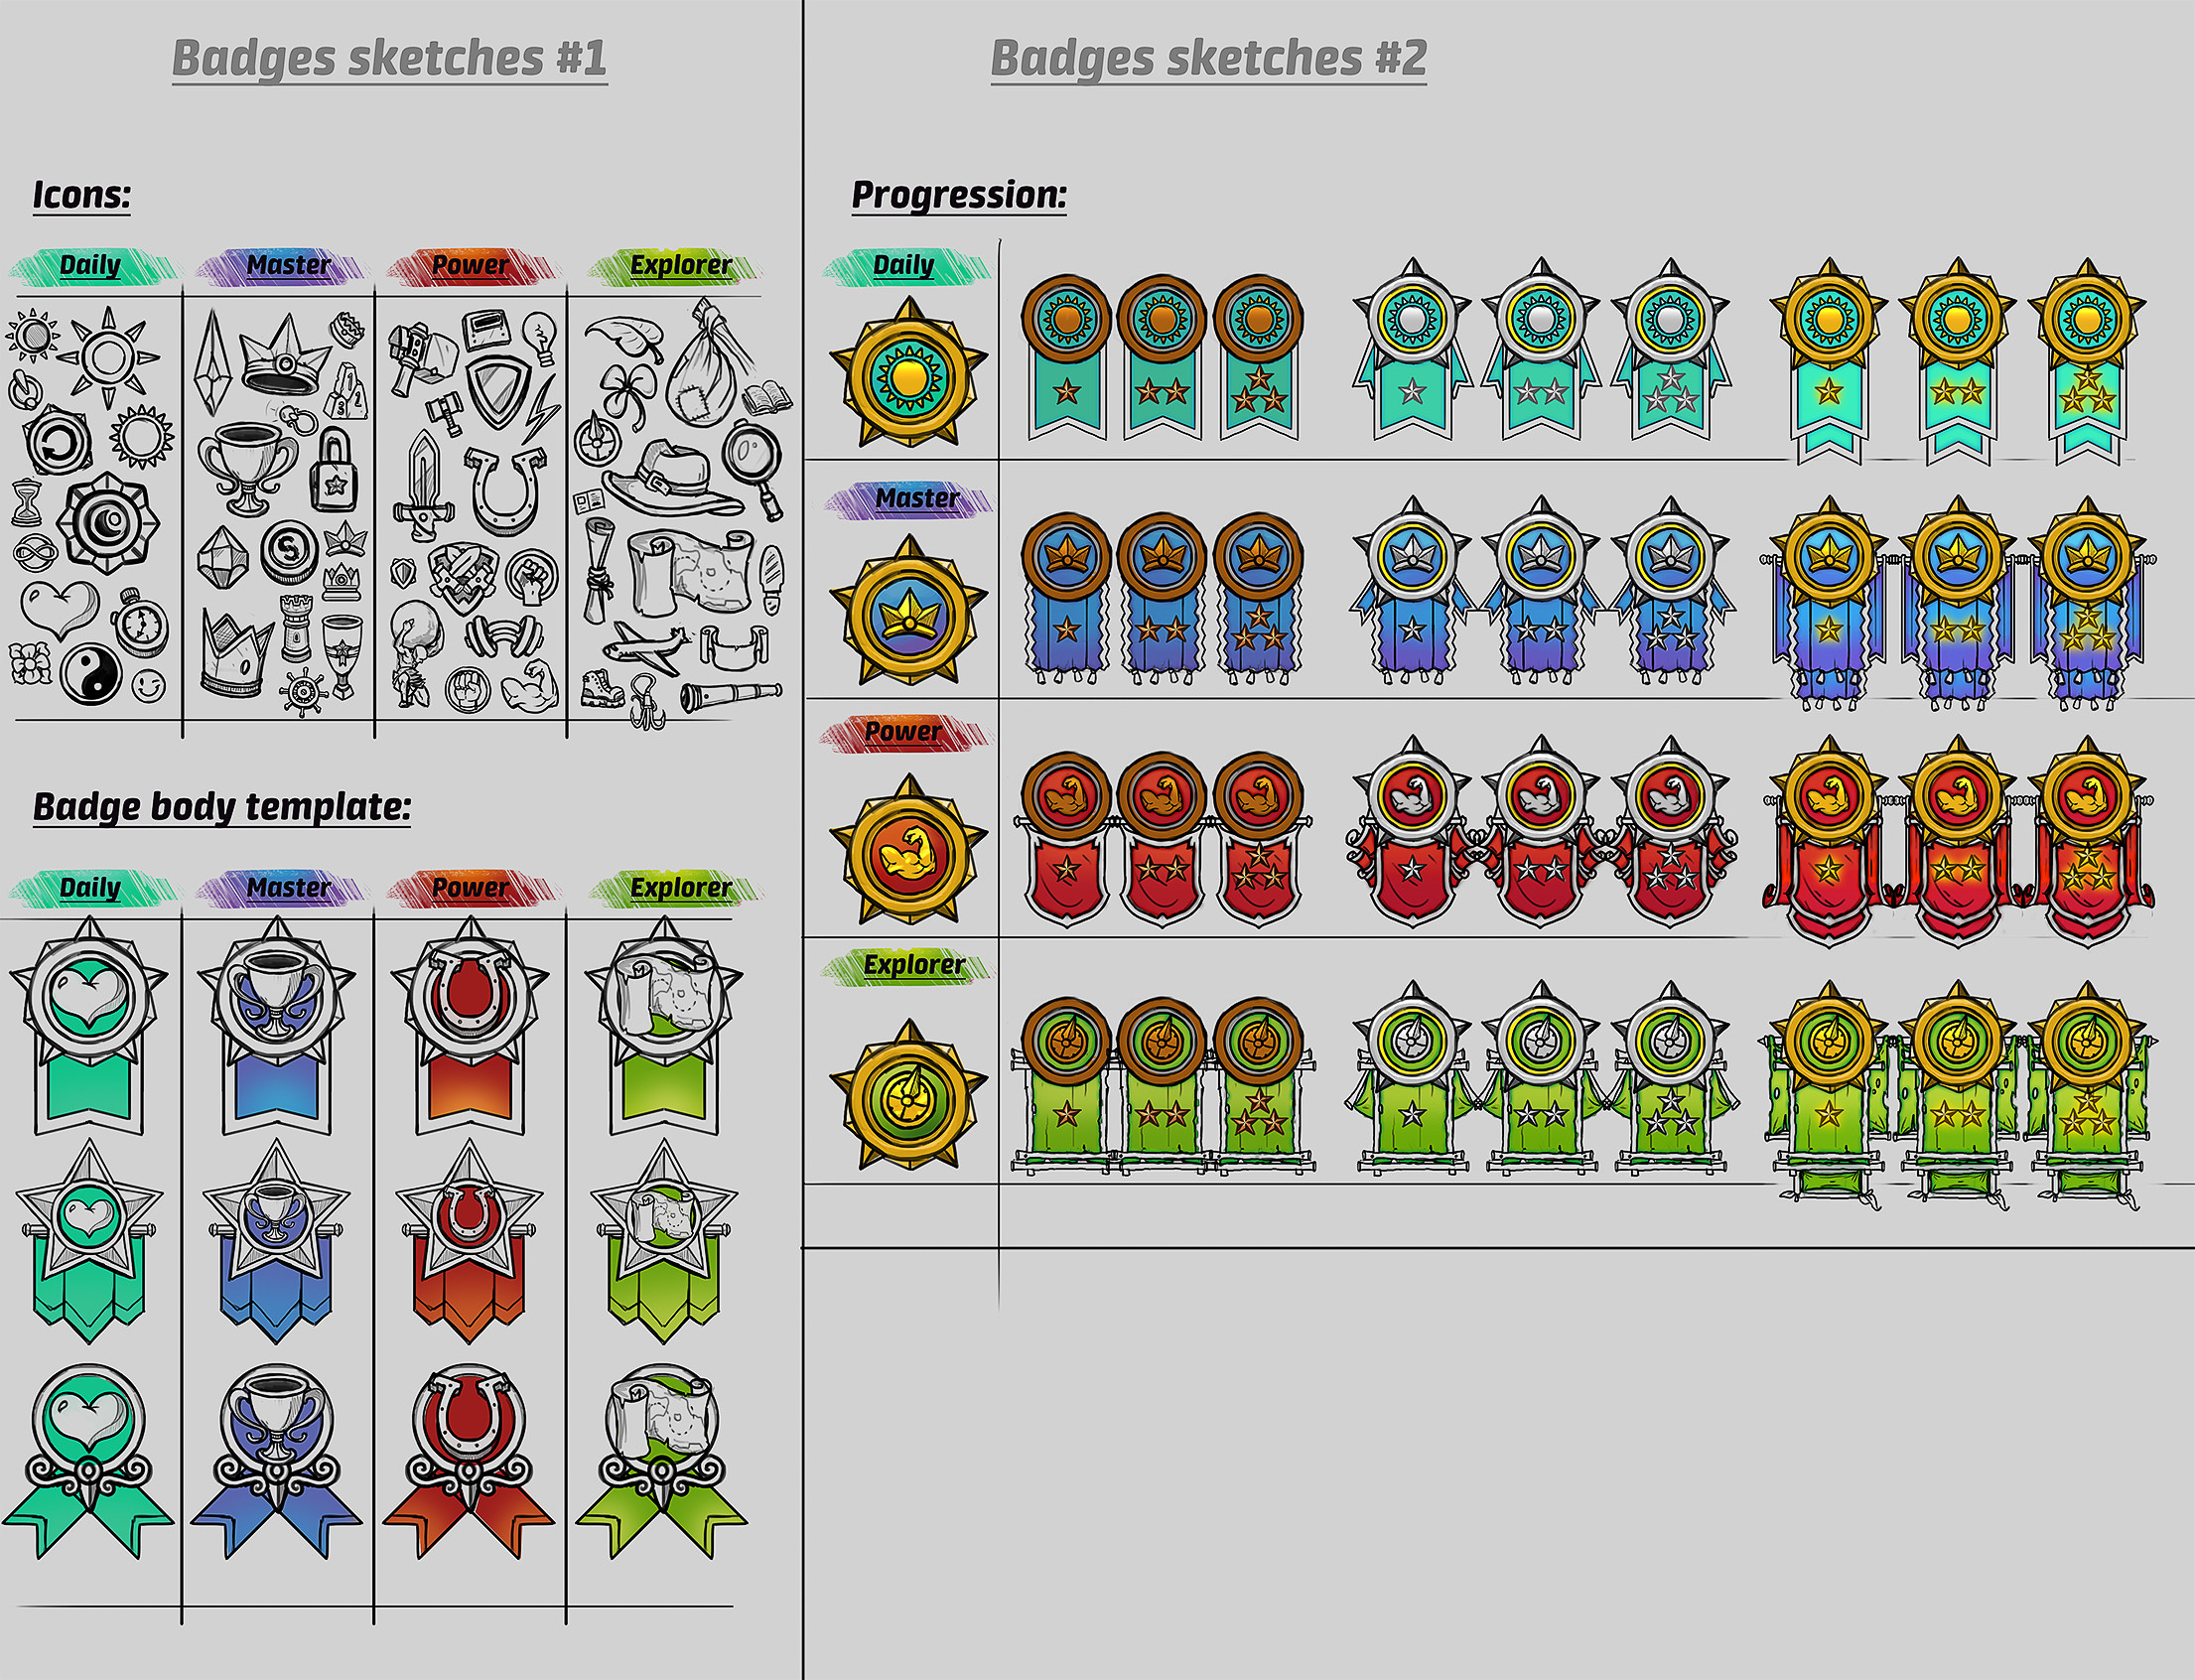 Badges sketches